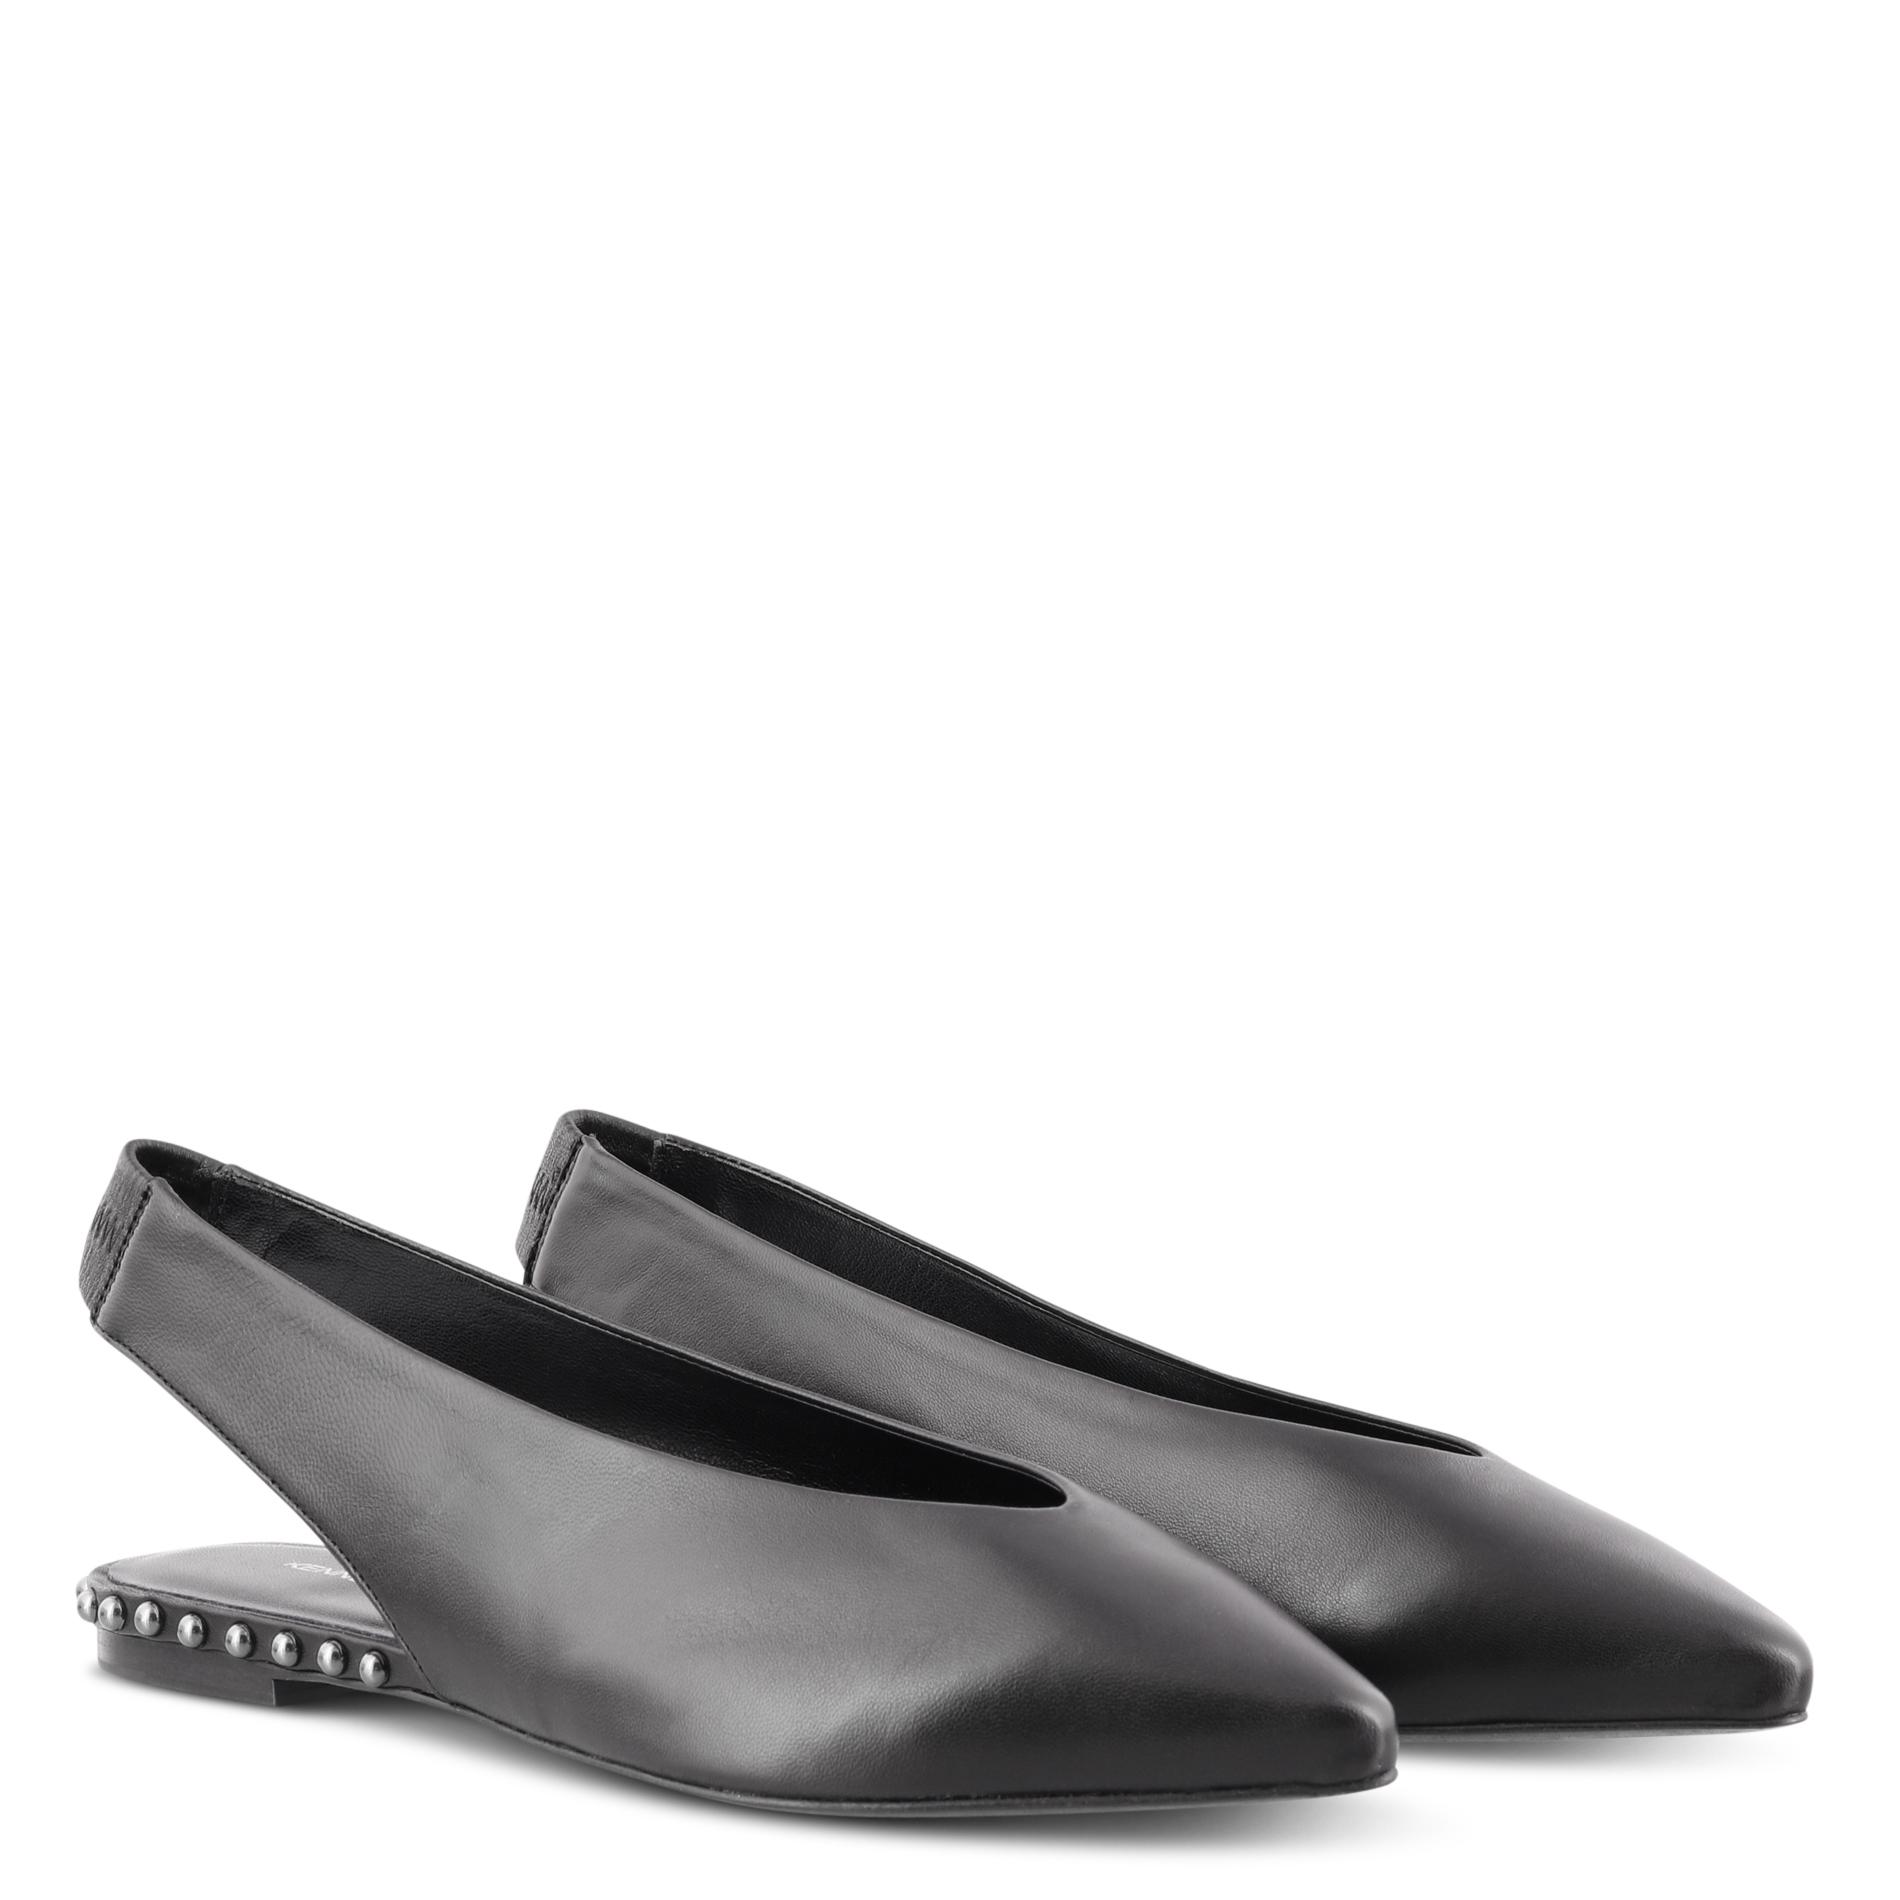 official store more photos new high quality SALE | Kennel & Schmenger Schuhe günstig online kaufen ...